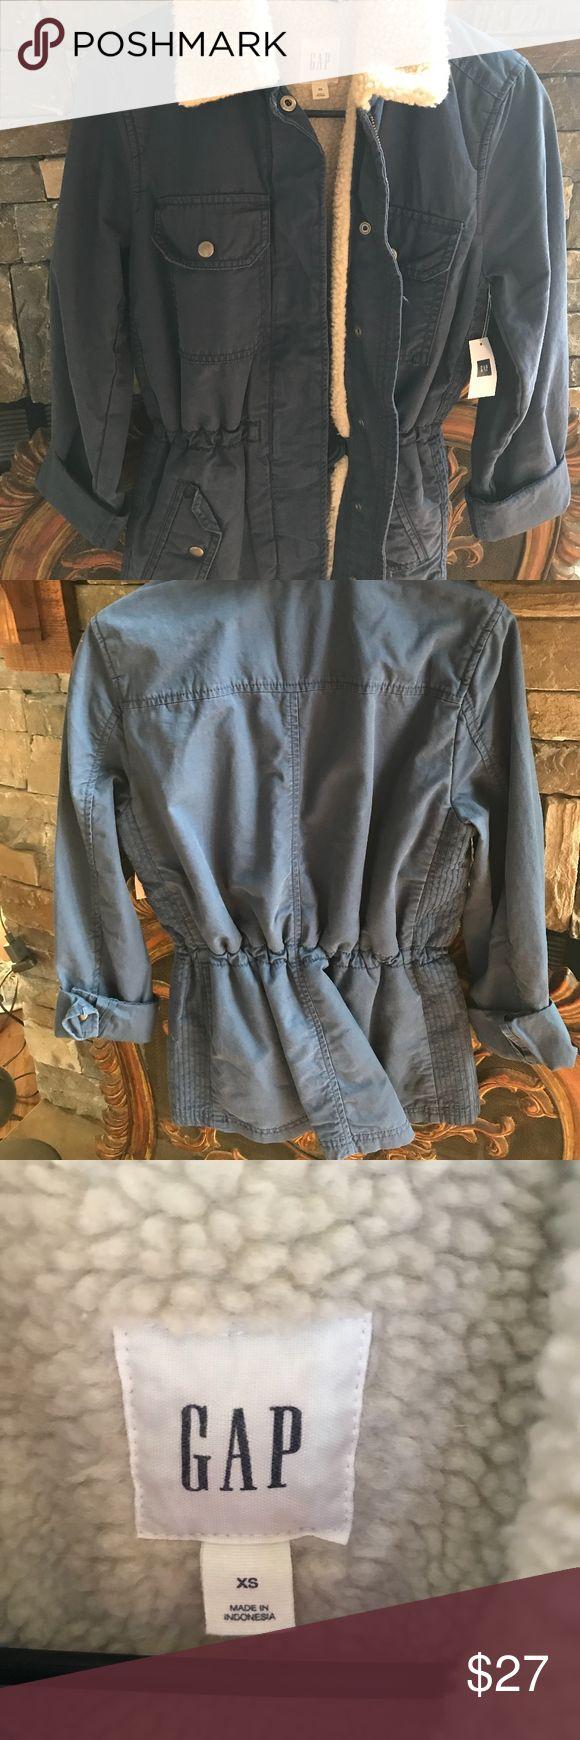 Gap Jacket NWT.  Navy Blue Gap Jacket.  Super cute.  Drawstring waist can be adjustable. GAP Jackets & Coats